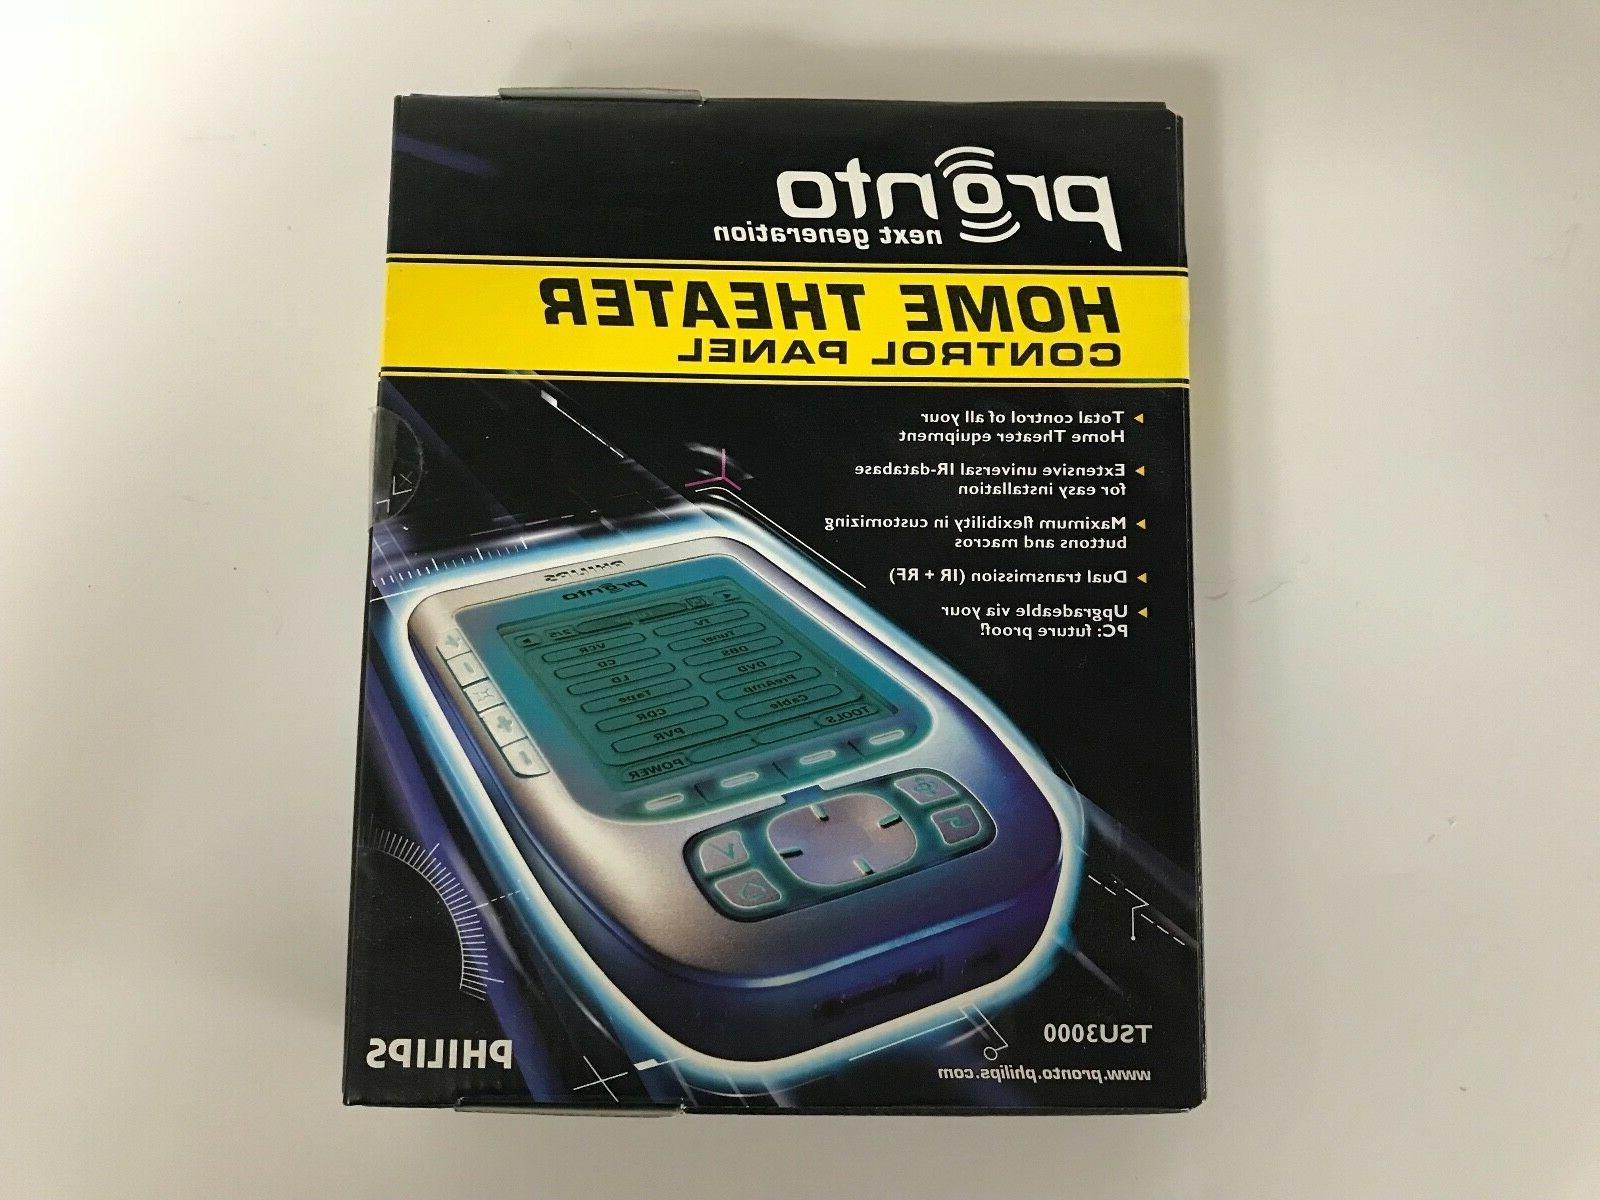 tsu3000 13 device pronto universal